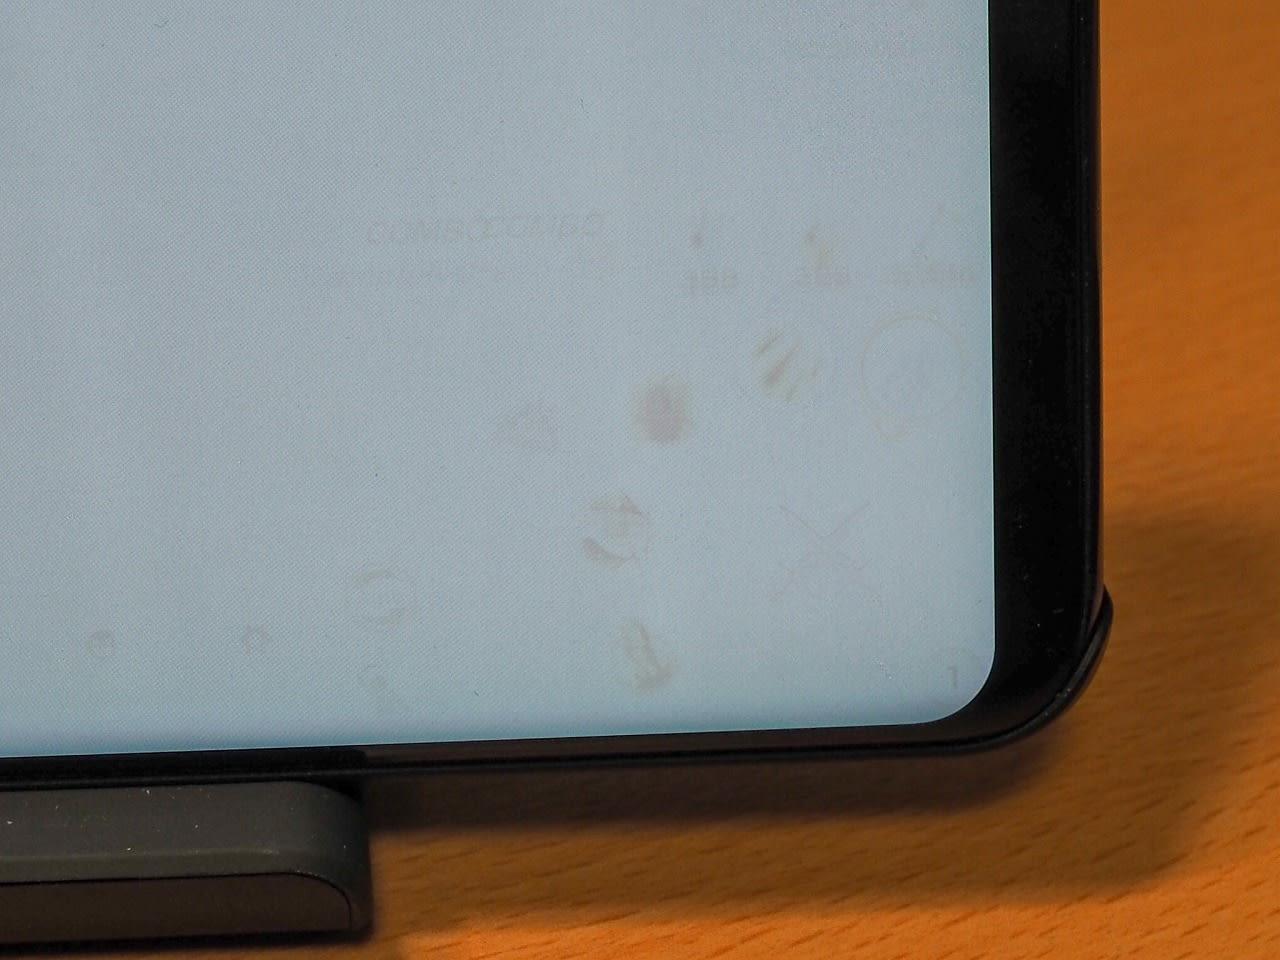 Galaxy S8 OLED